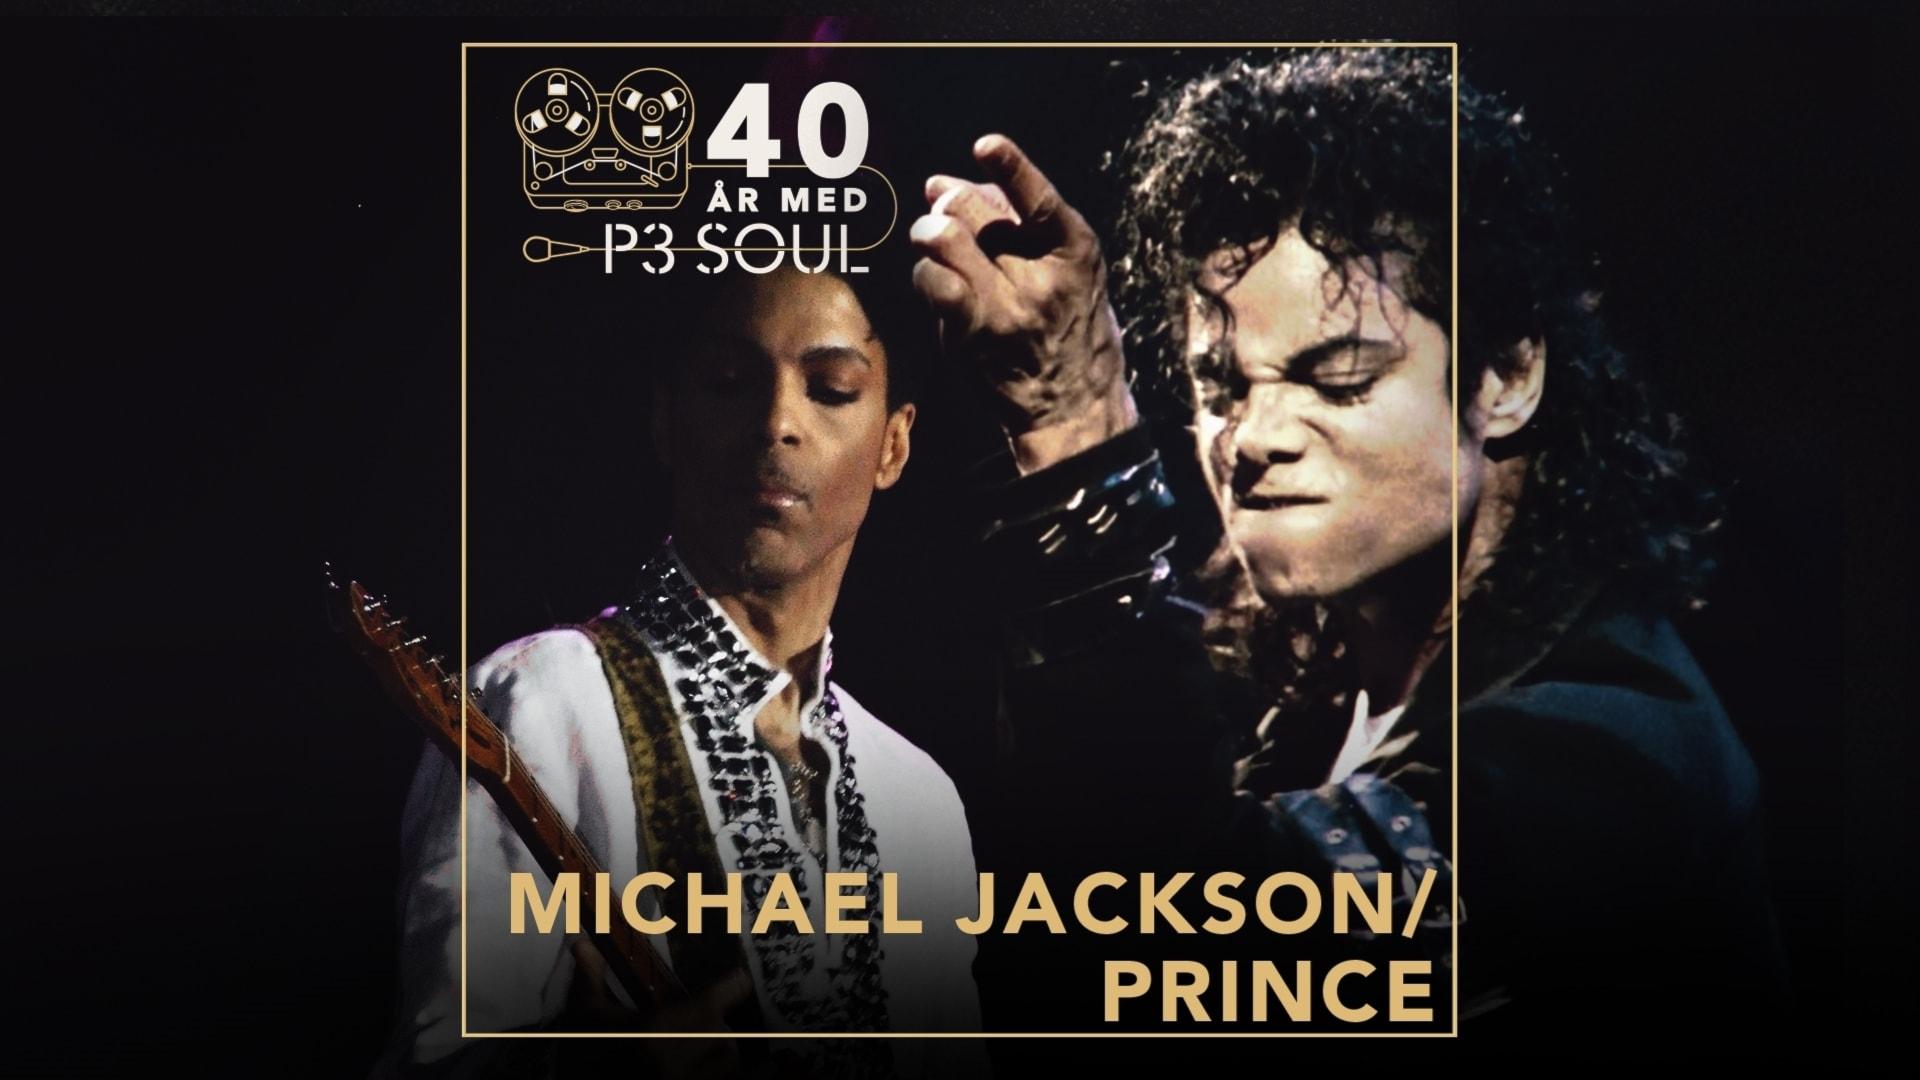 40 år med P3 Soul: Prince & Michael Jackson